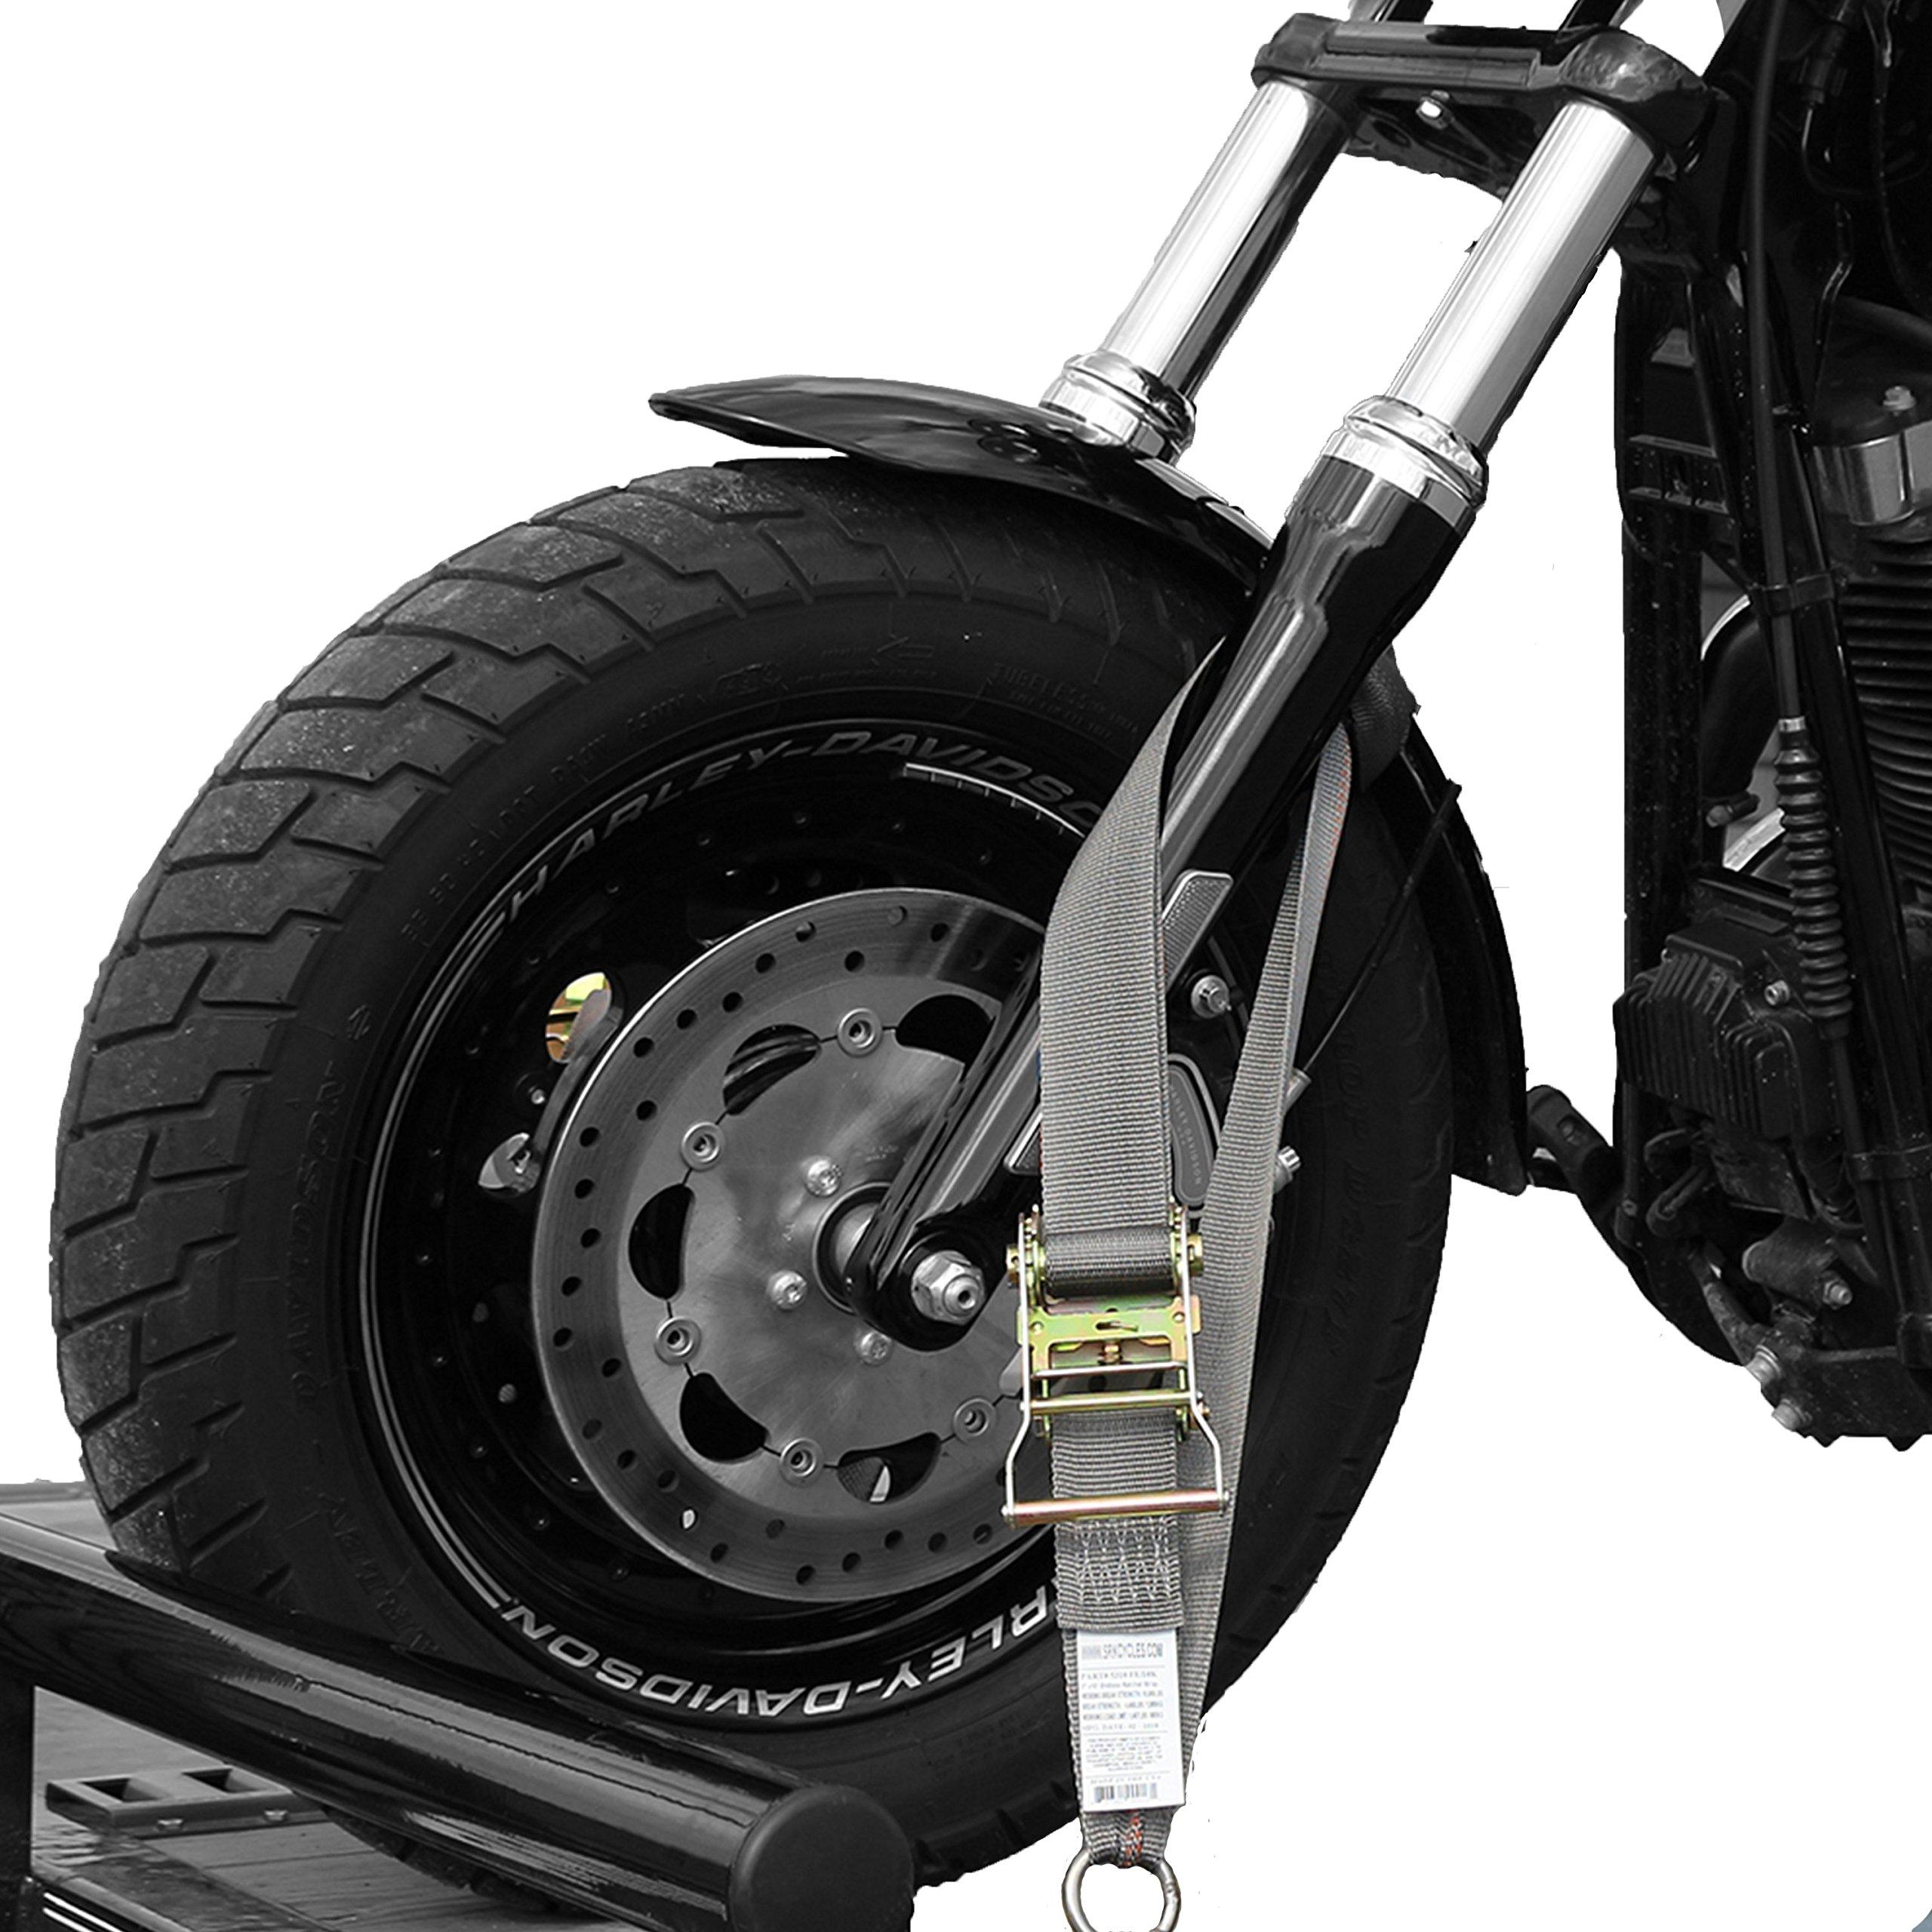 Tank Straps Motorcycle Tie down Straps (2pk) - 10.000 lb Webbing Break Strength 2'' x 10' SUPER Heavy Duty Endless Tie Downs With Ratchet Strap - Strongest in Market